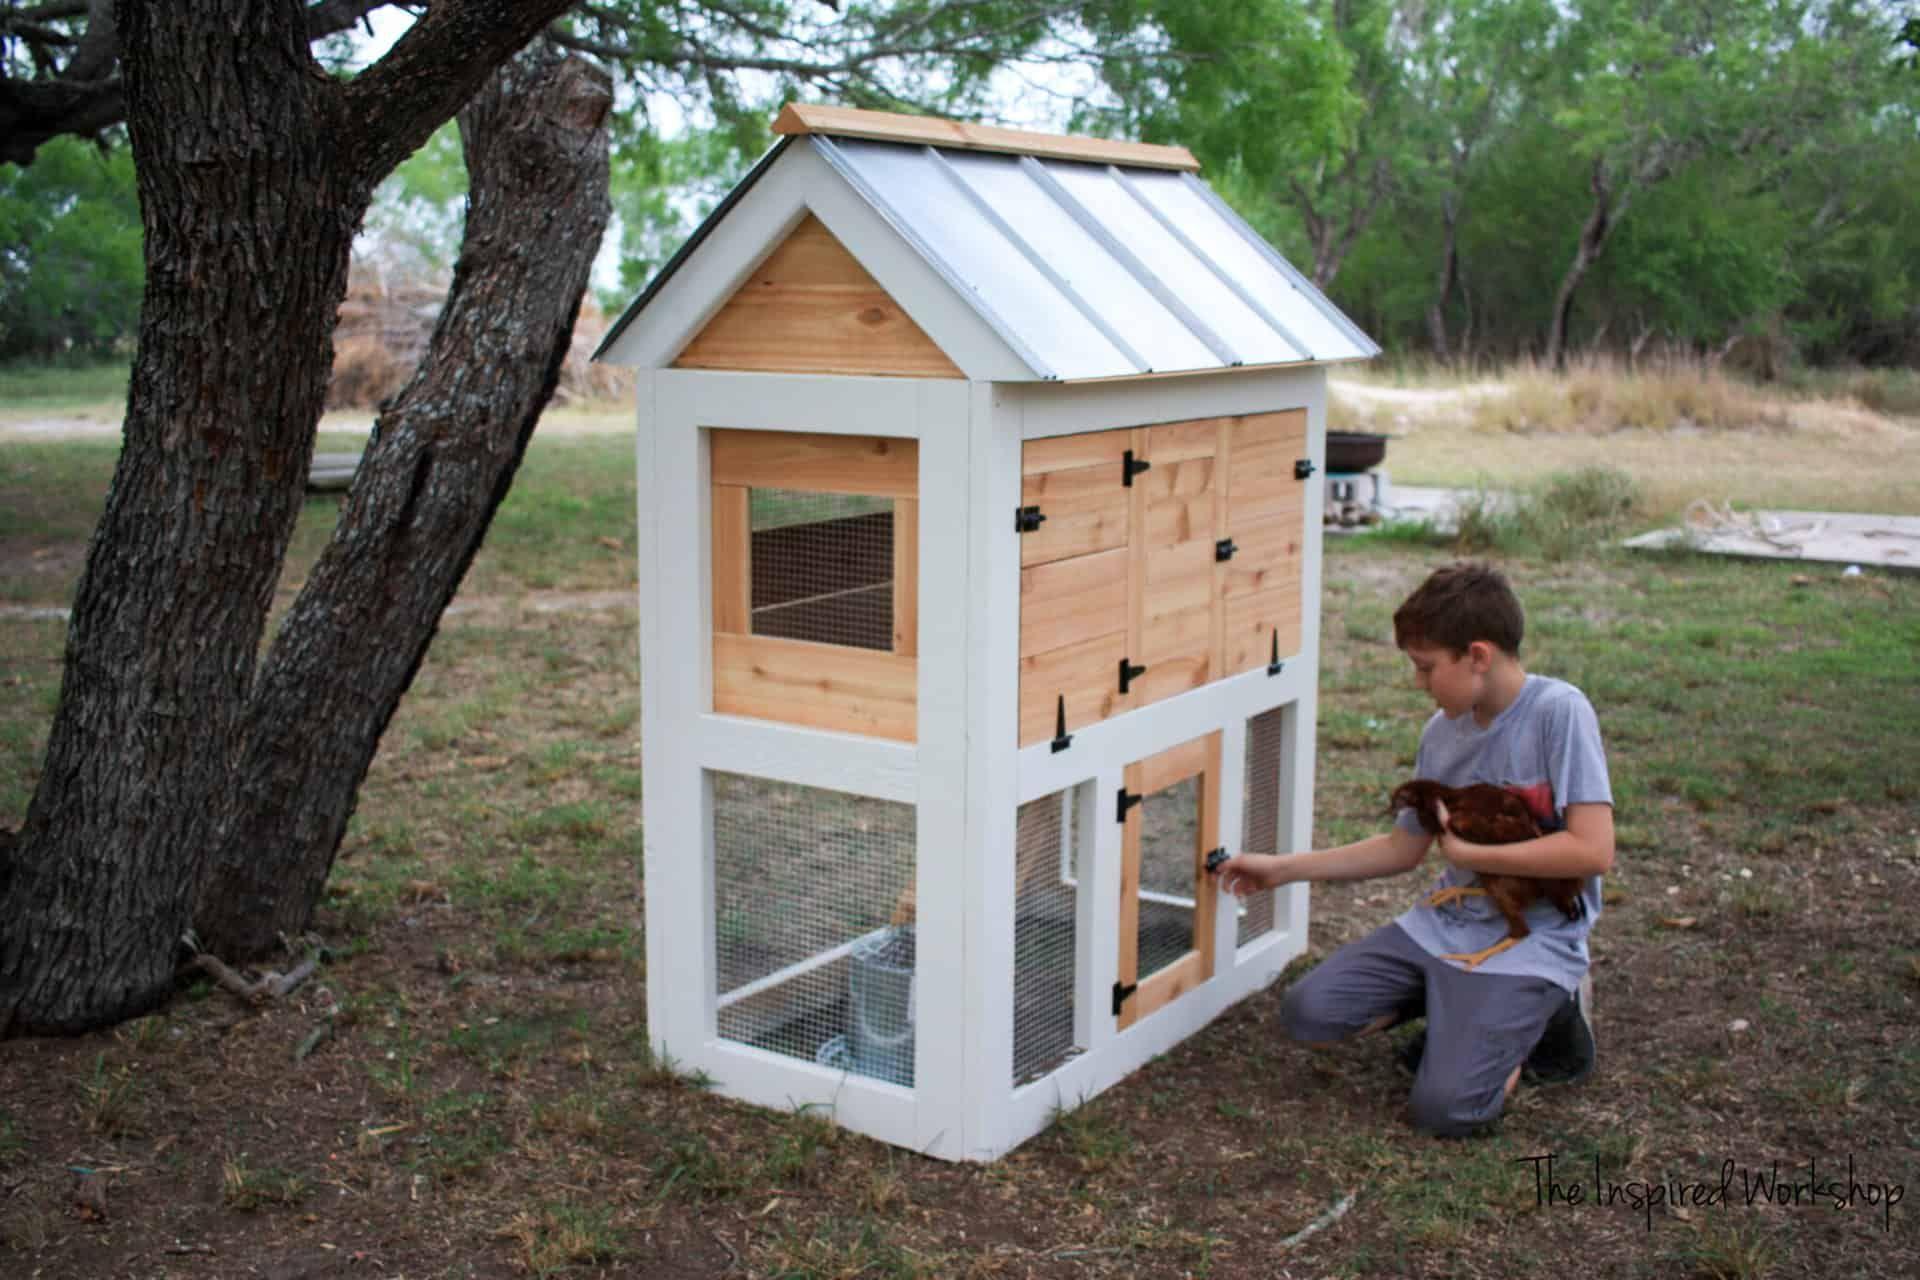 Easy Backyard Chicken Coop Plans Small Chicken Coops Chickens Backyard Backyard Chicken Coops